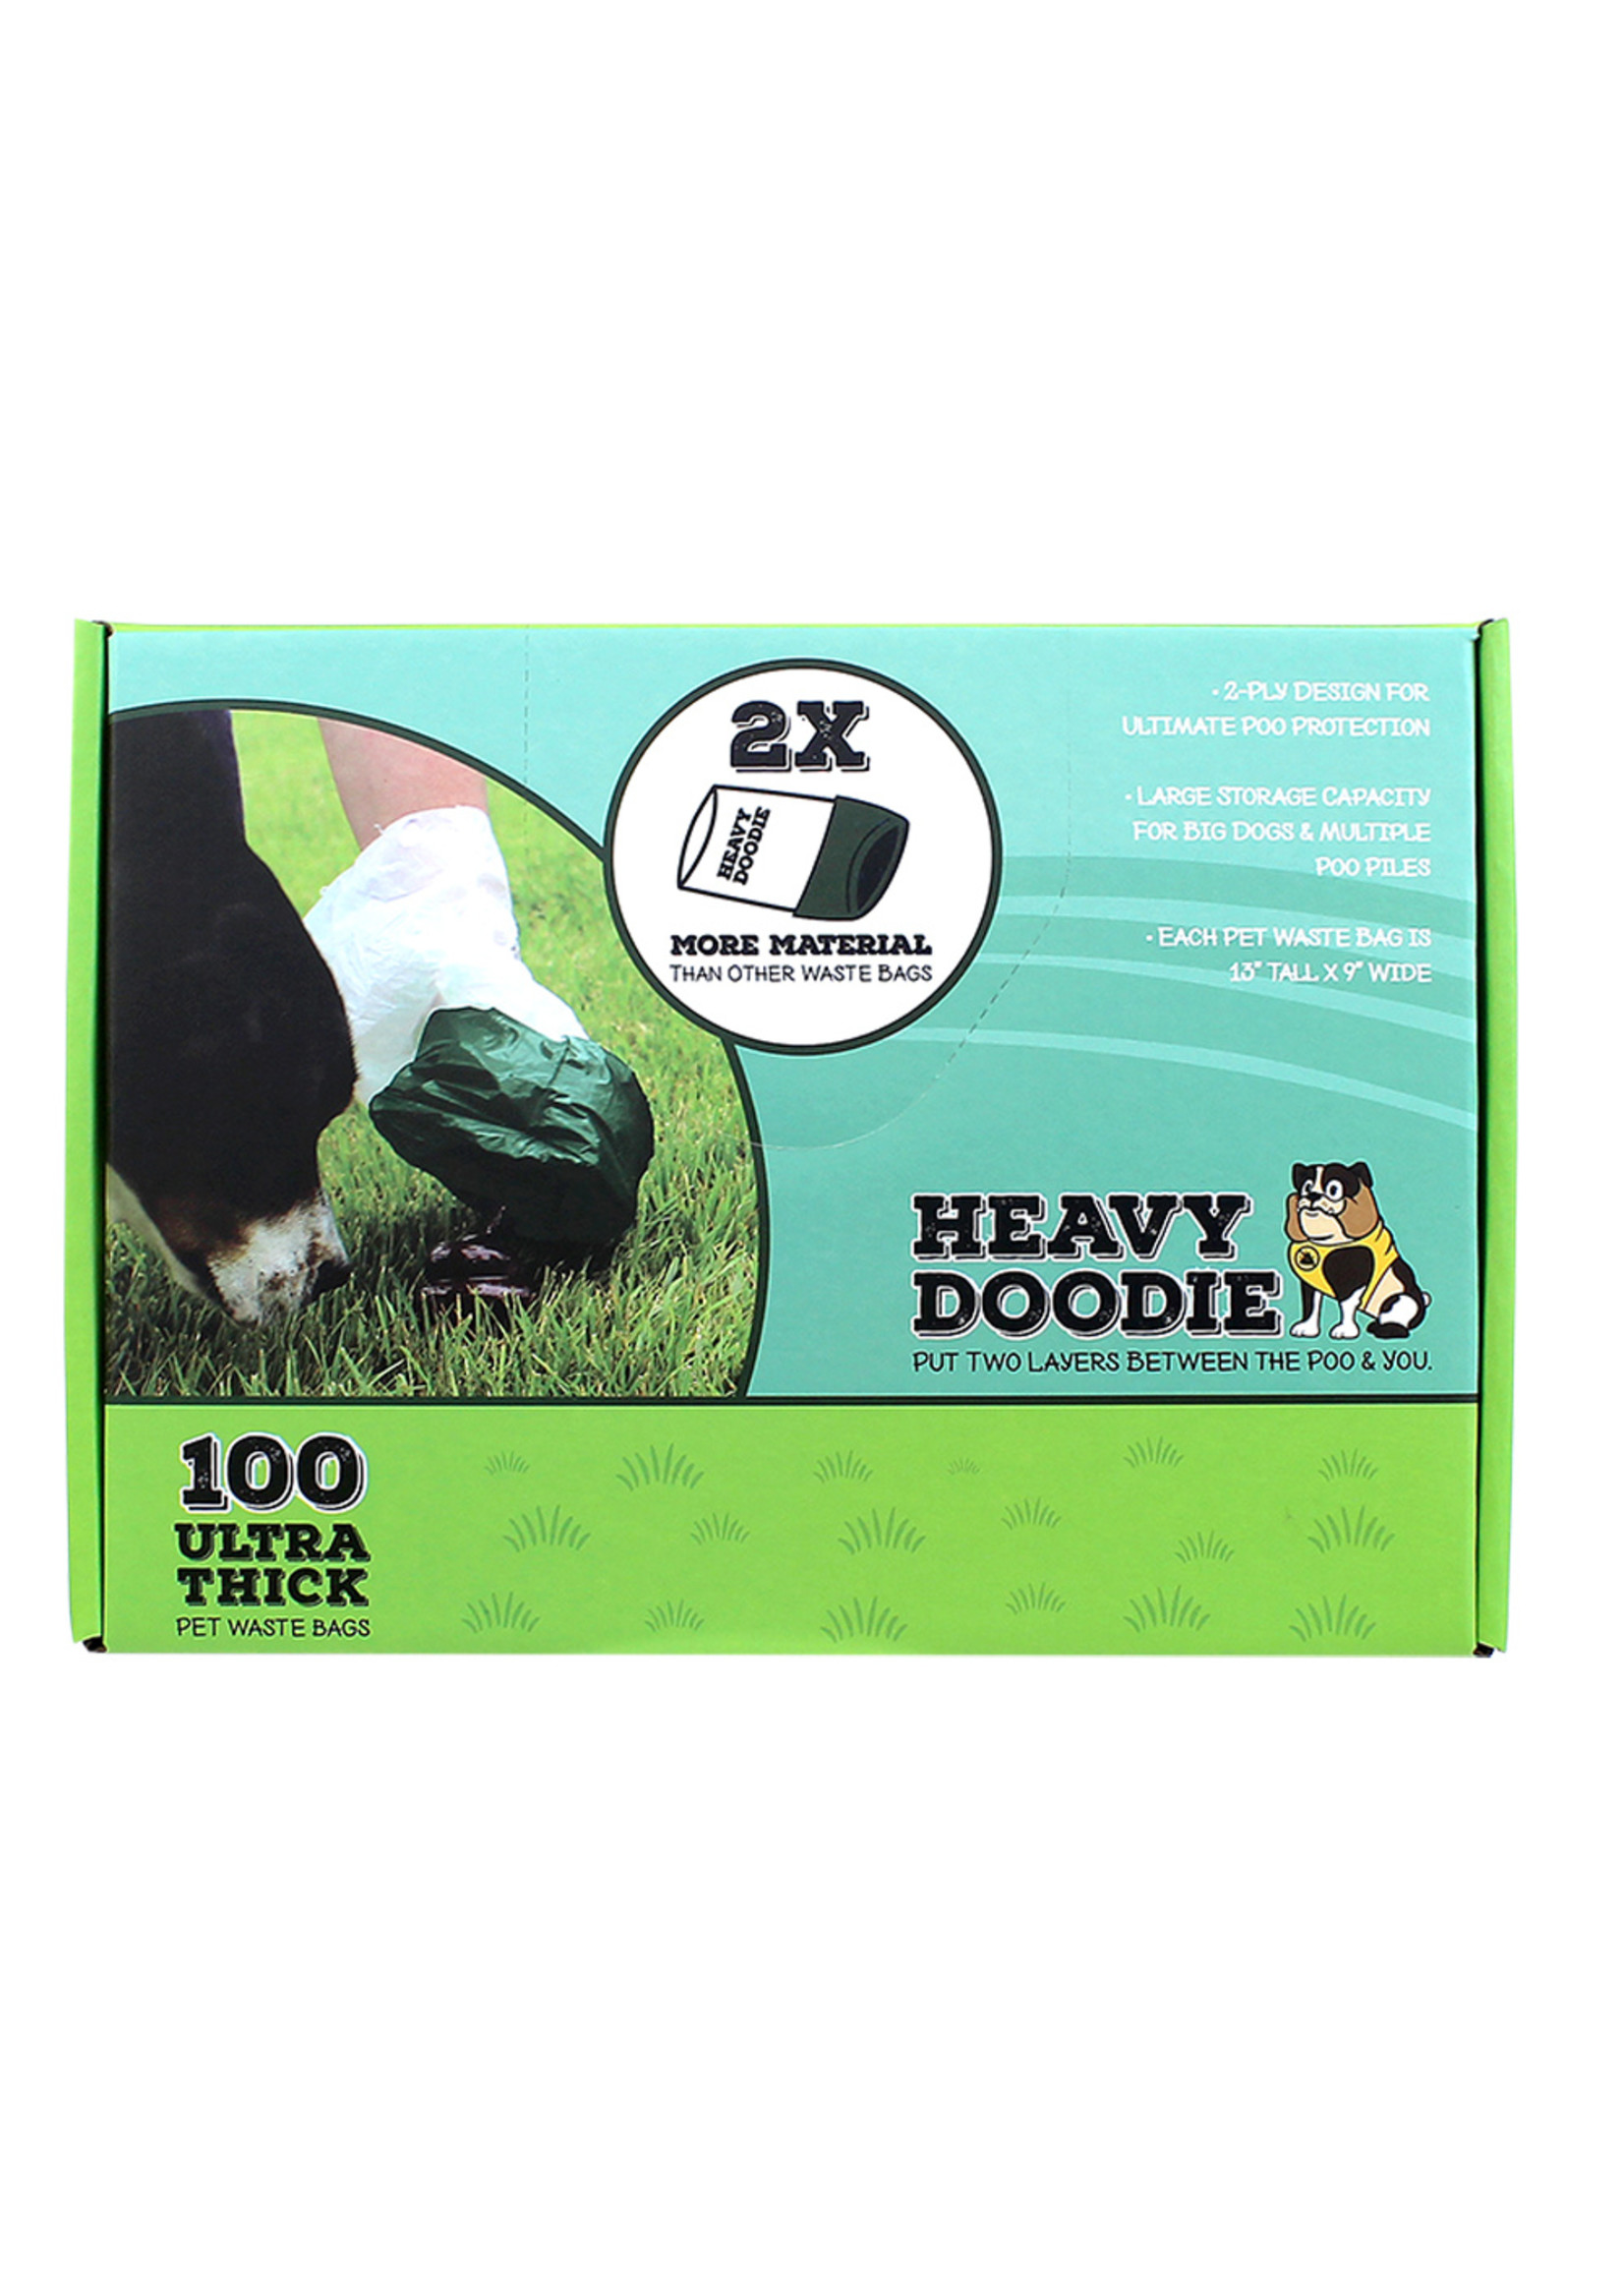 Alcott Heavy Doodie 2 Ply Waste Bag 100 count